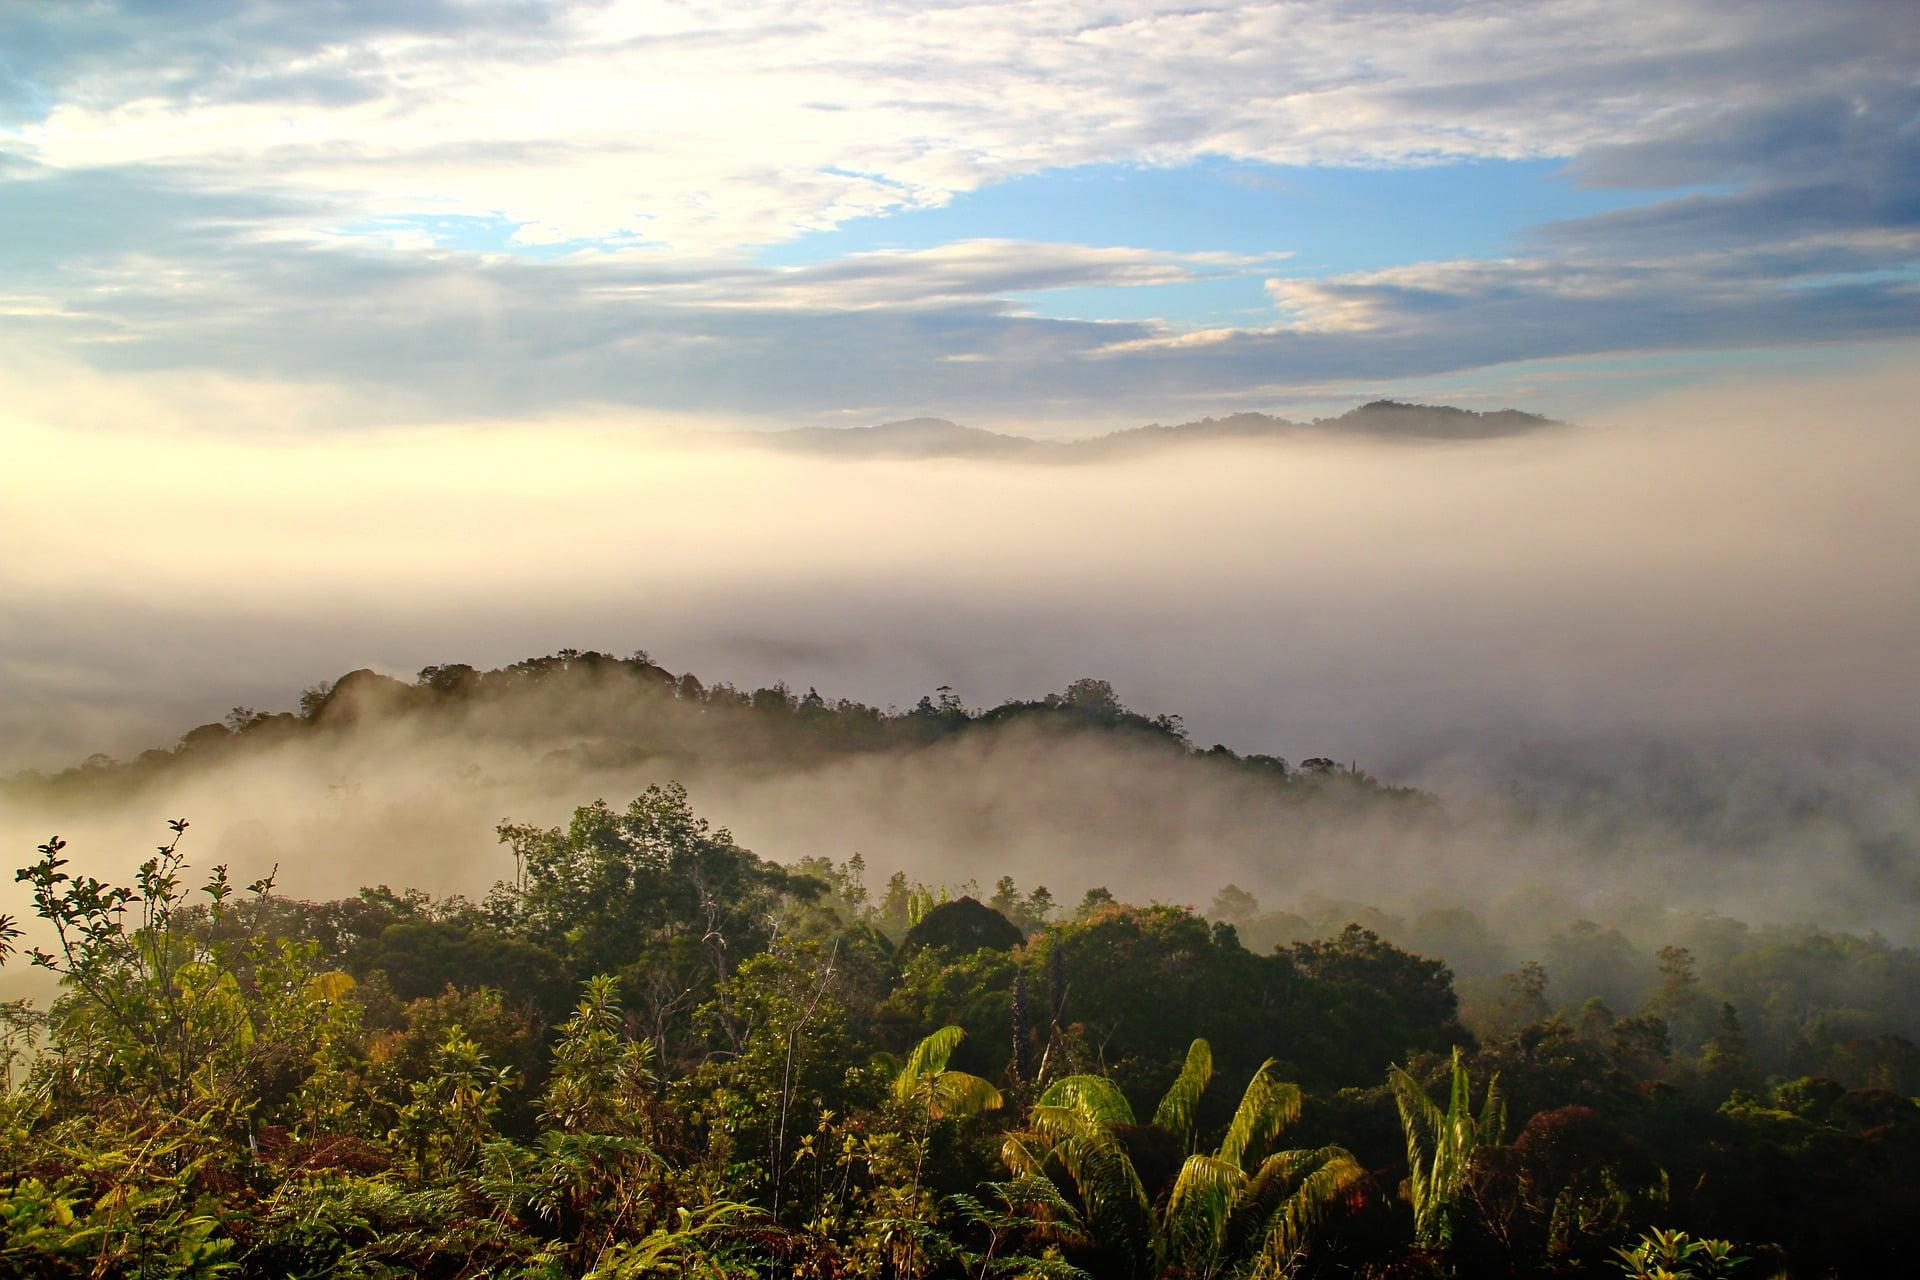 Sarawak (Malaysian State in Borneo) - photo by labanglonghouse under Pixabay License